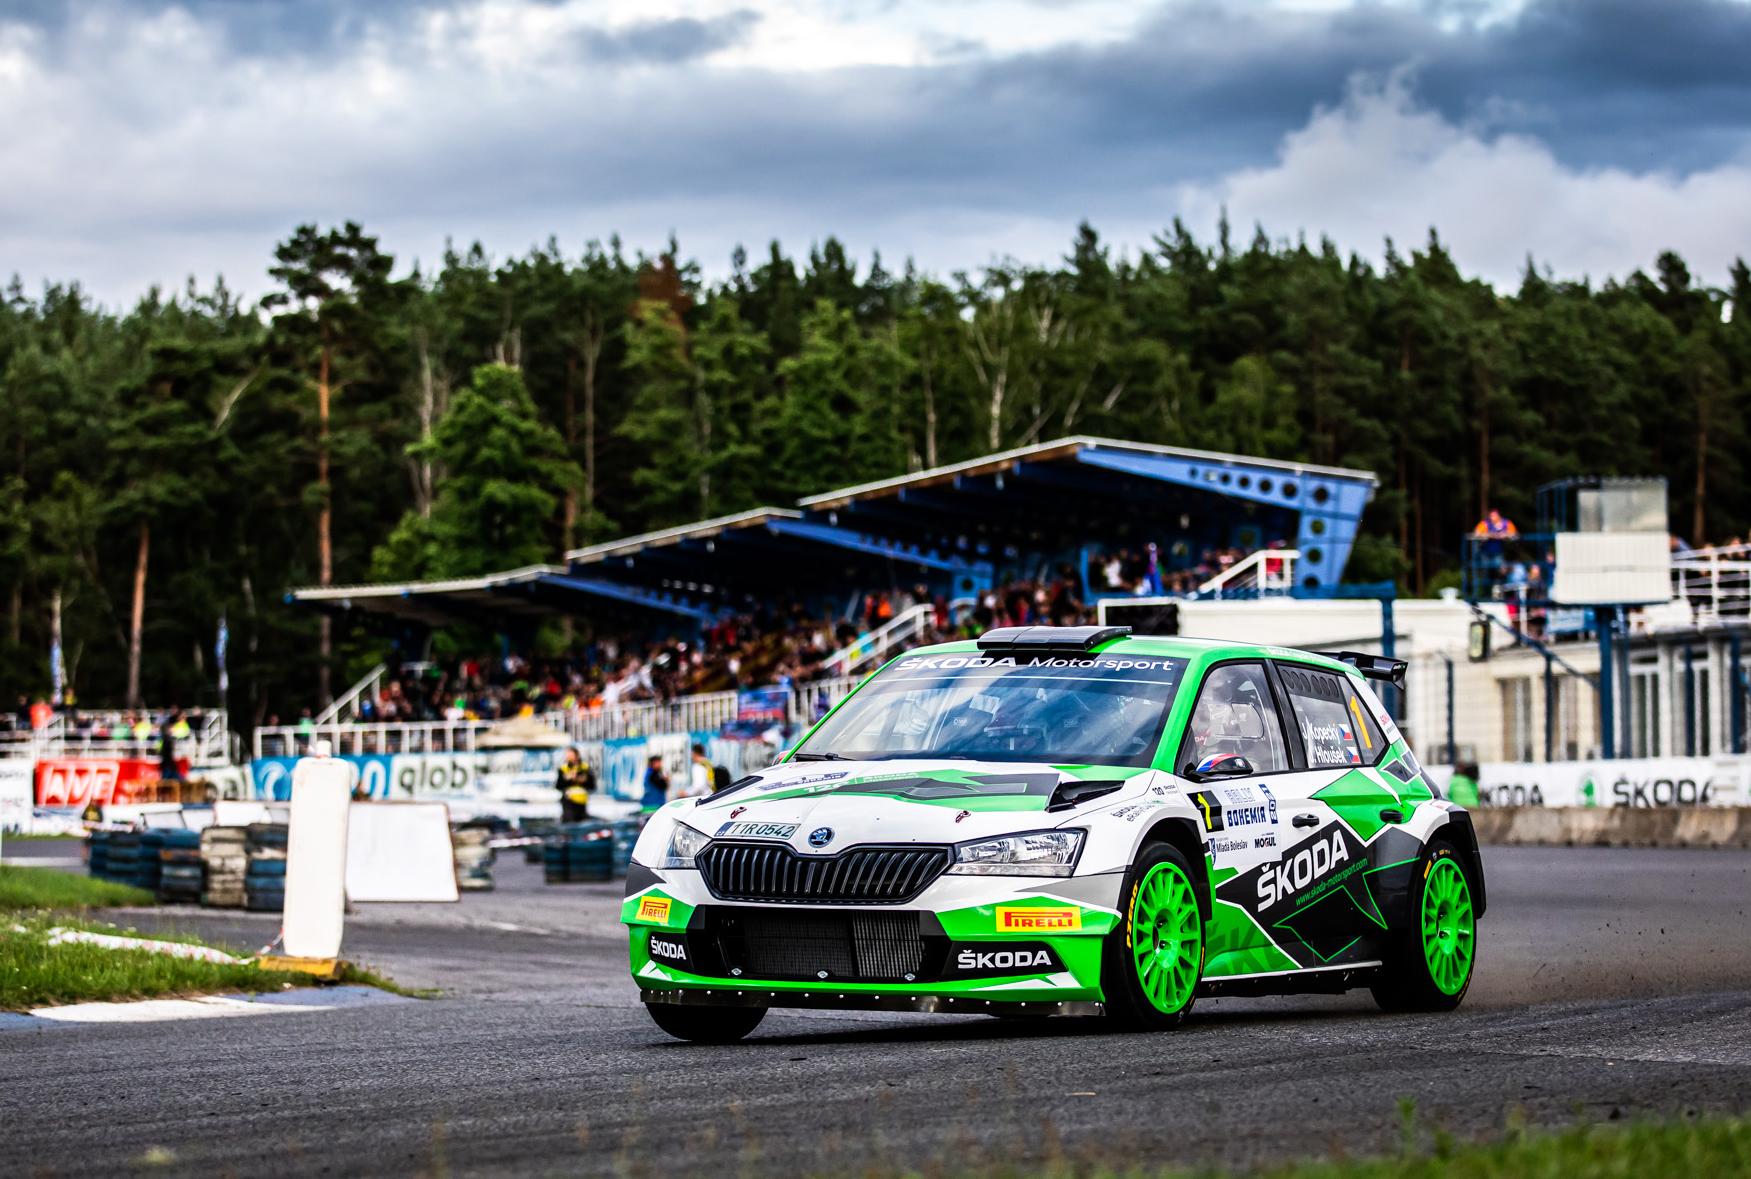 Jan Kopecký celebrates 120 years of SKODA in motorsport with ninth victory at Bohemia Rally - Image 2